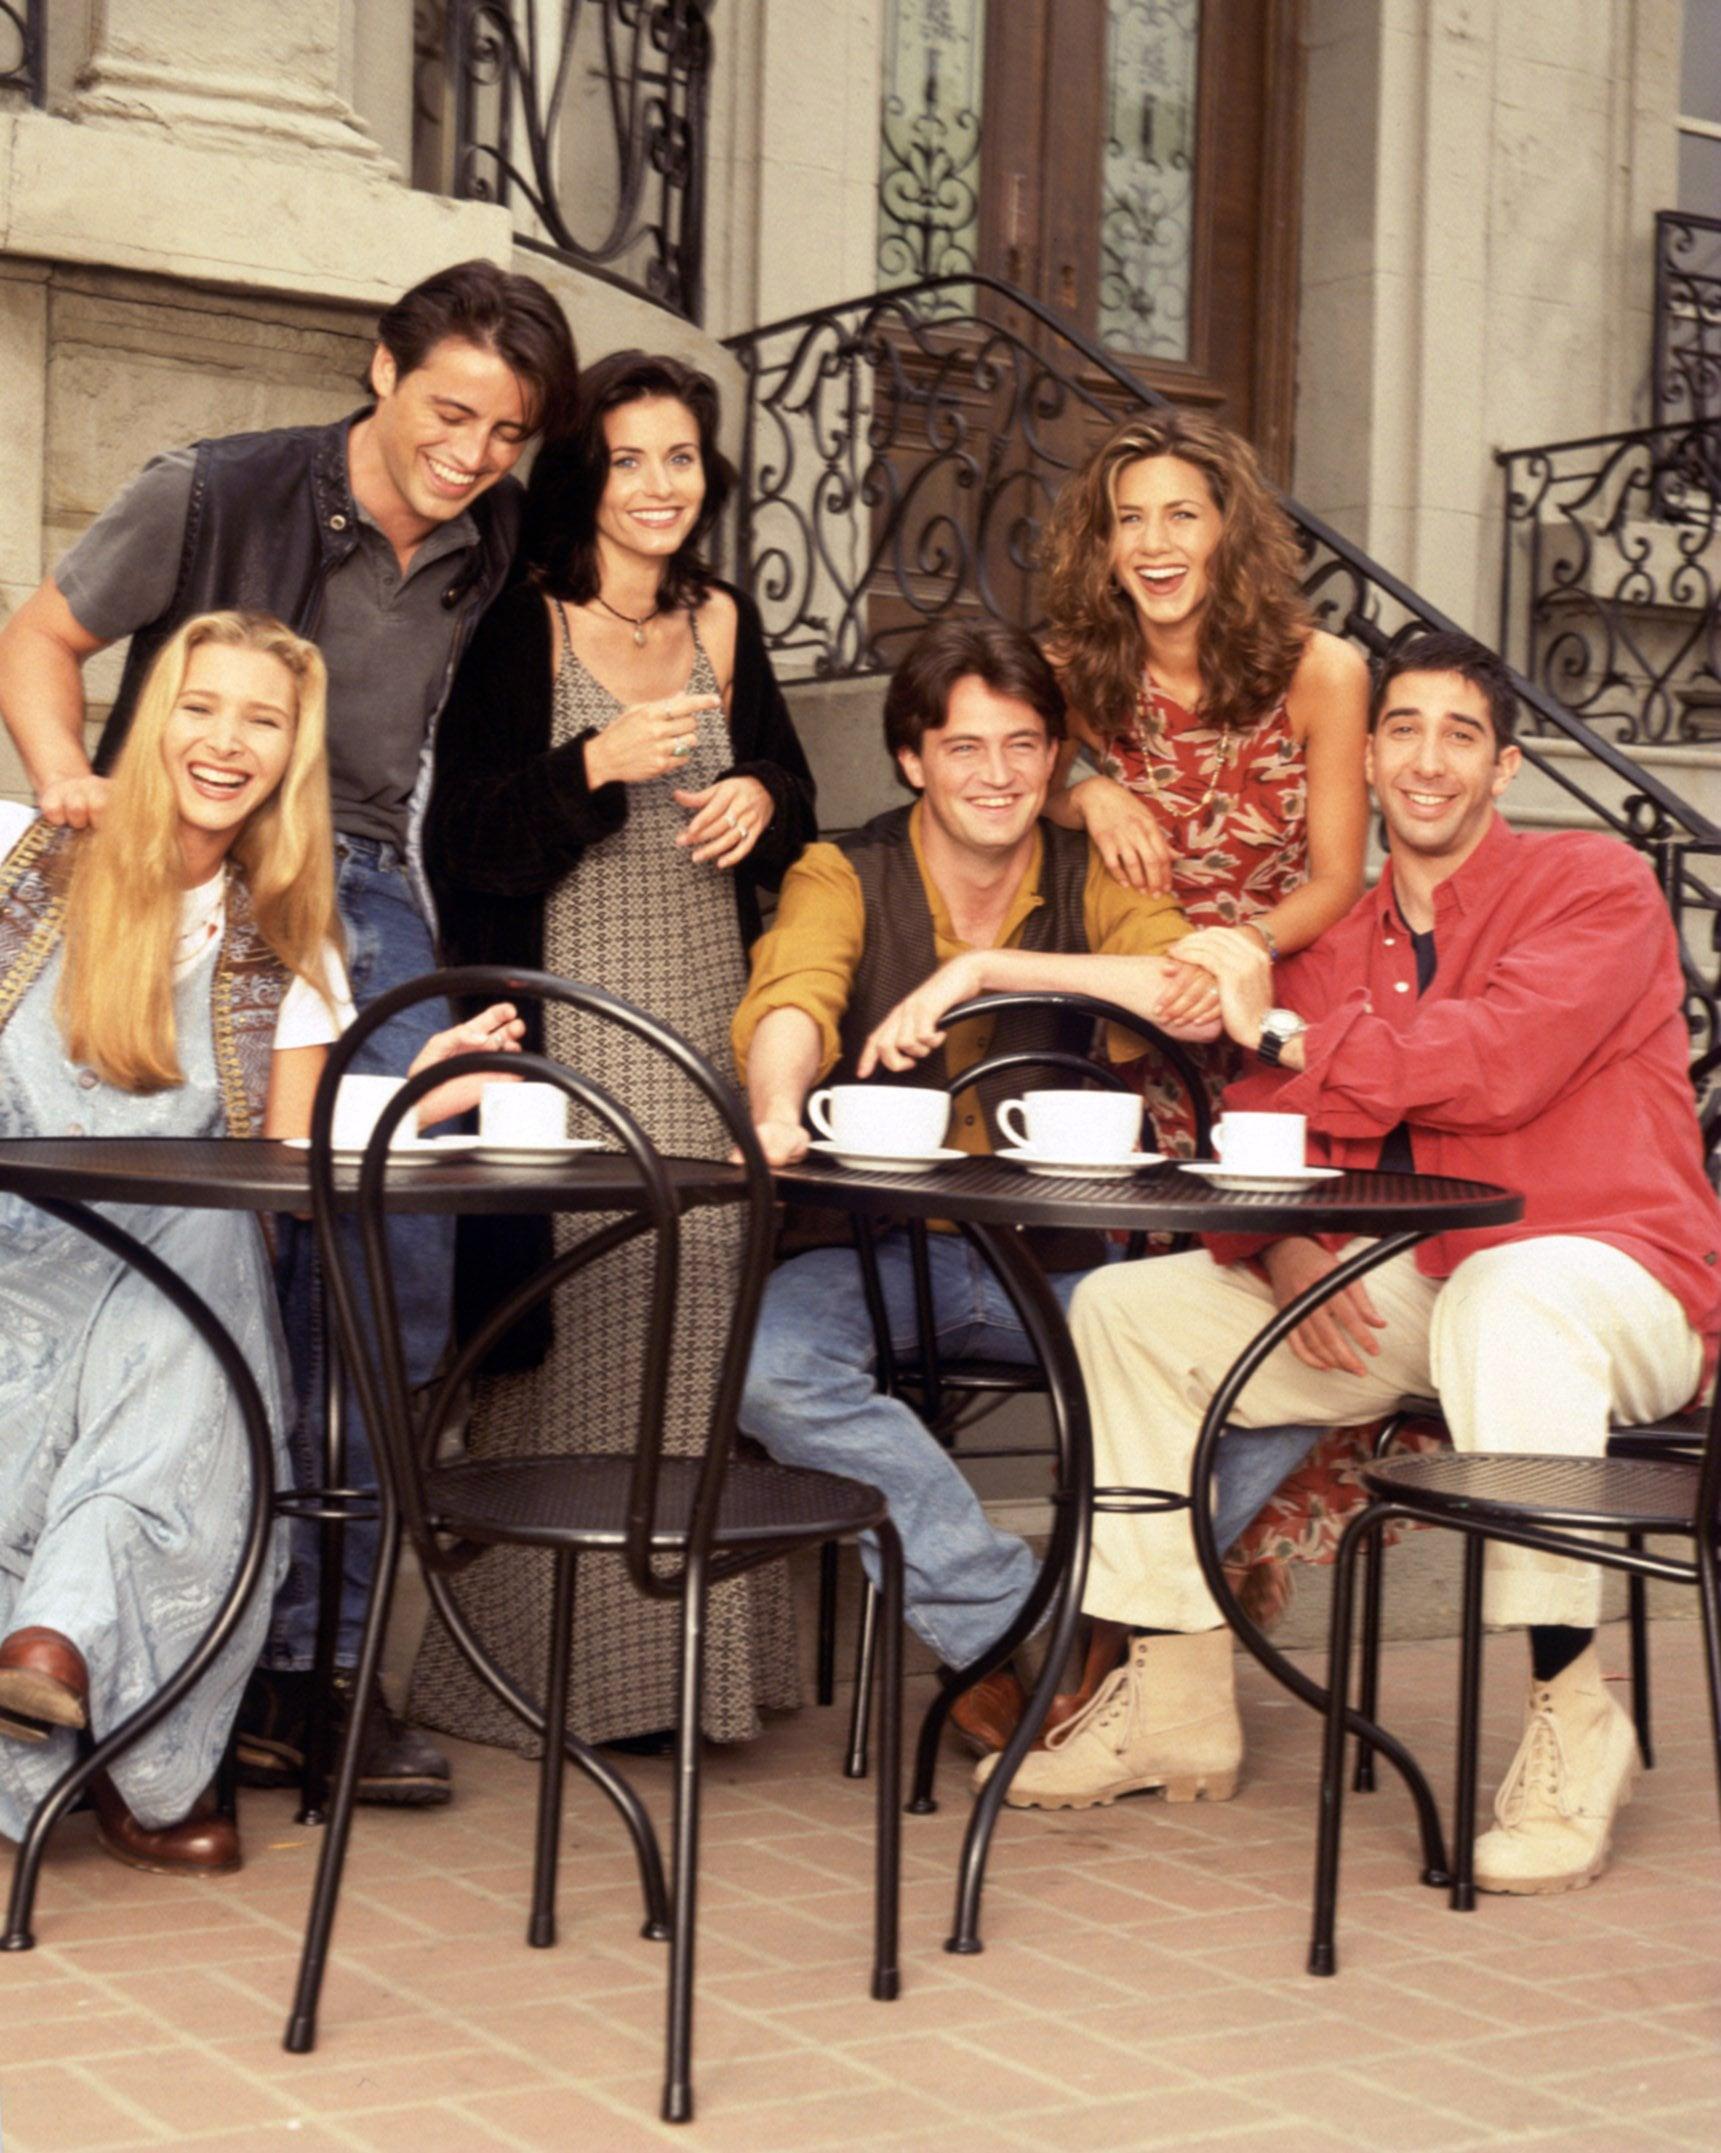 FRIENDS, Lisa Kudrow, Matt LeBlanc, Courteney Cox, Matthew Perry, Jennifer Aniston, David Schwimmer, (Season 1), 1994-2004, (c)Warner Bros. Television/courtesy Everett Collection